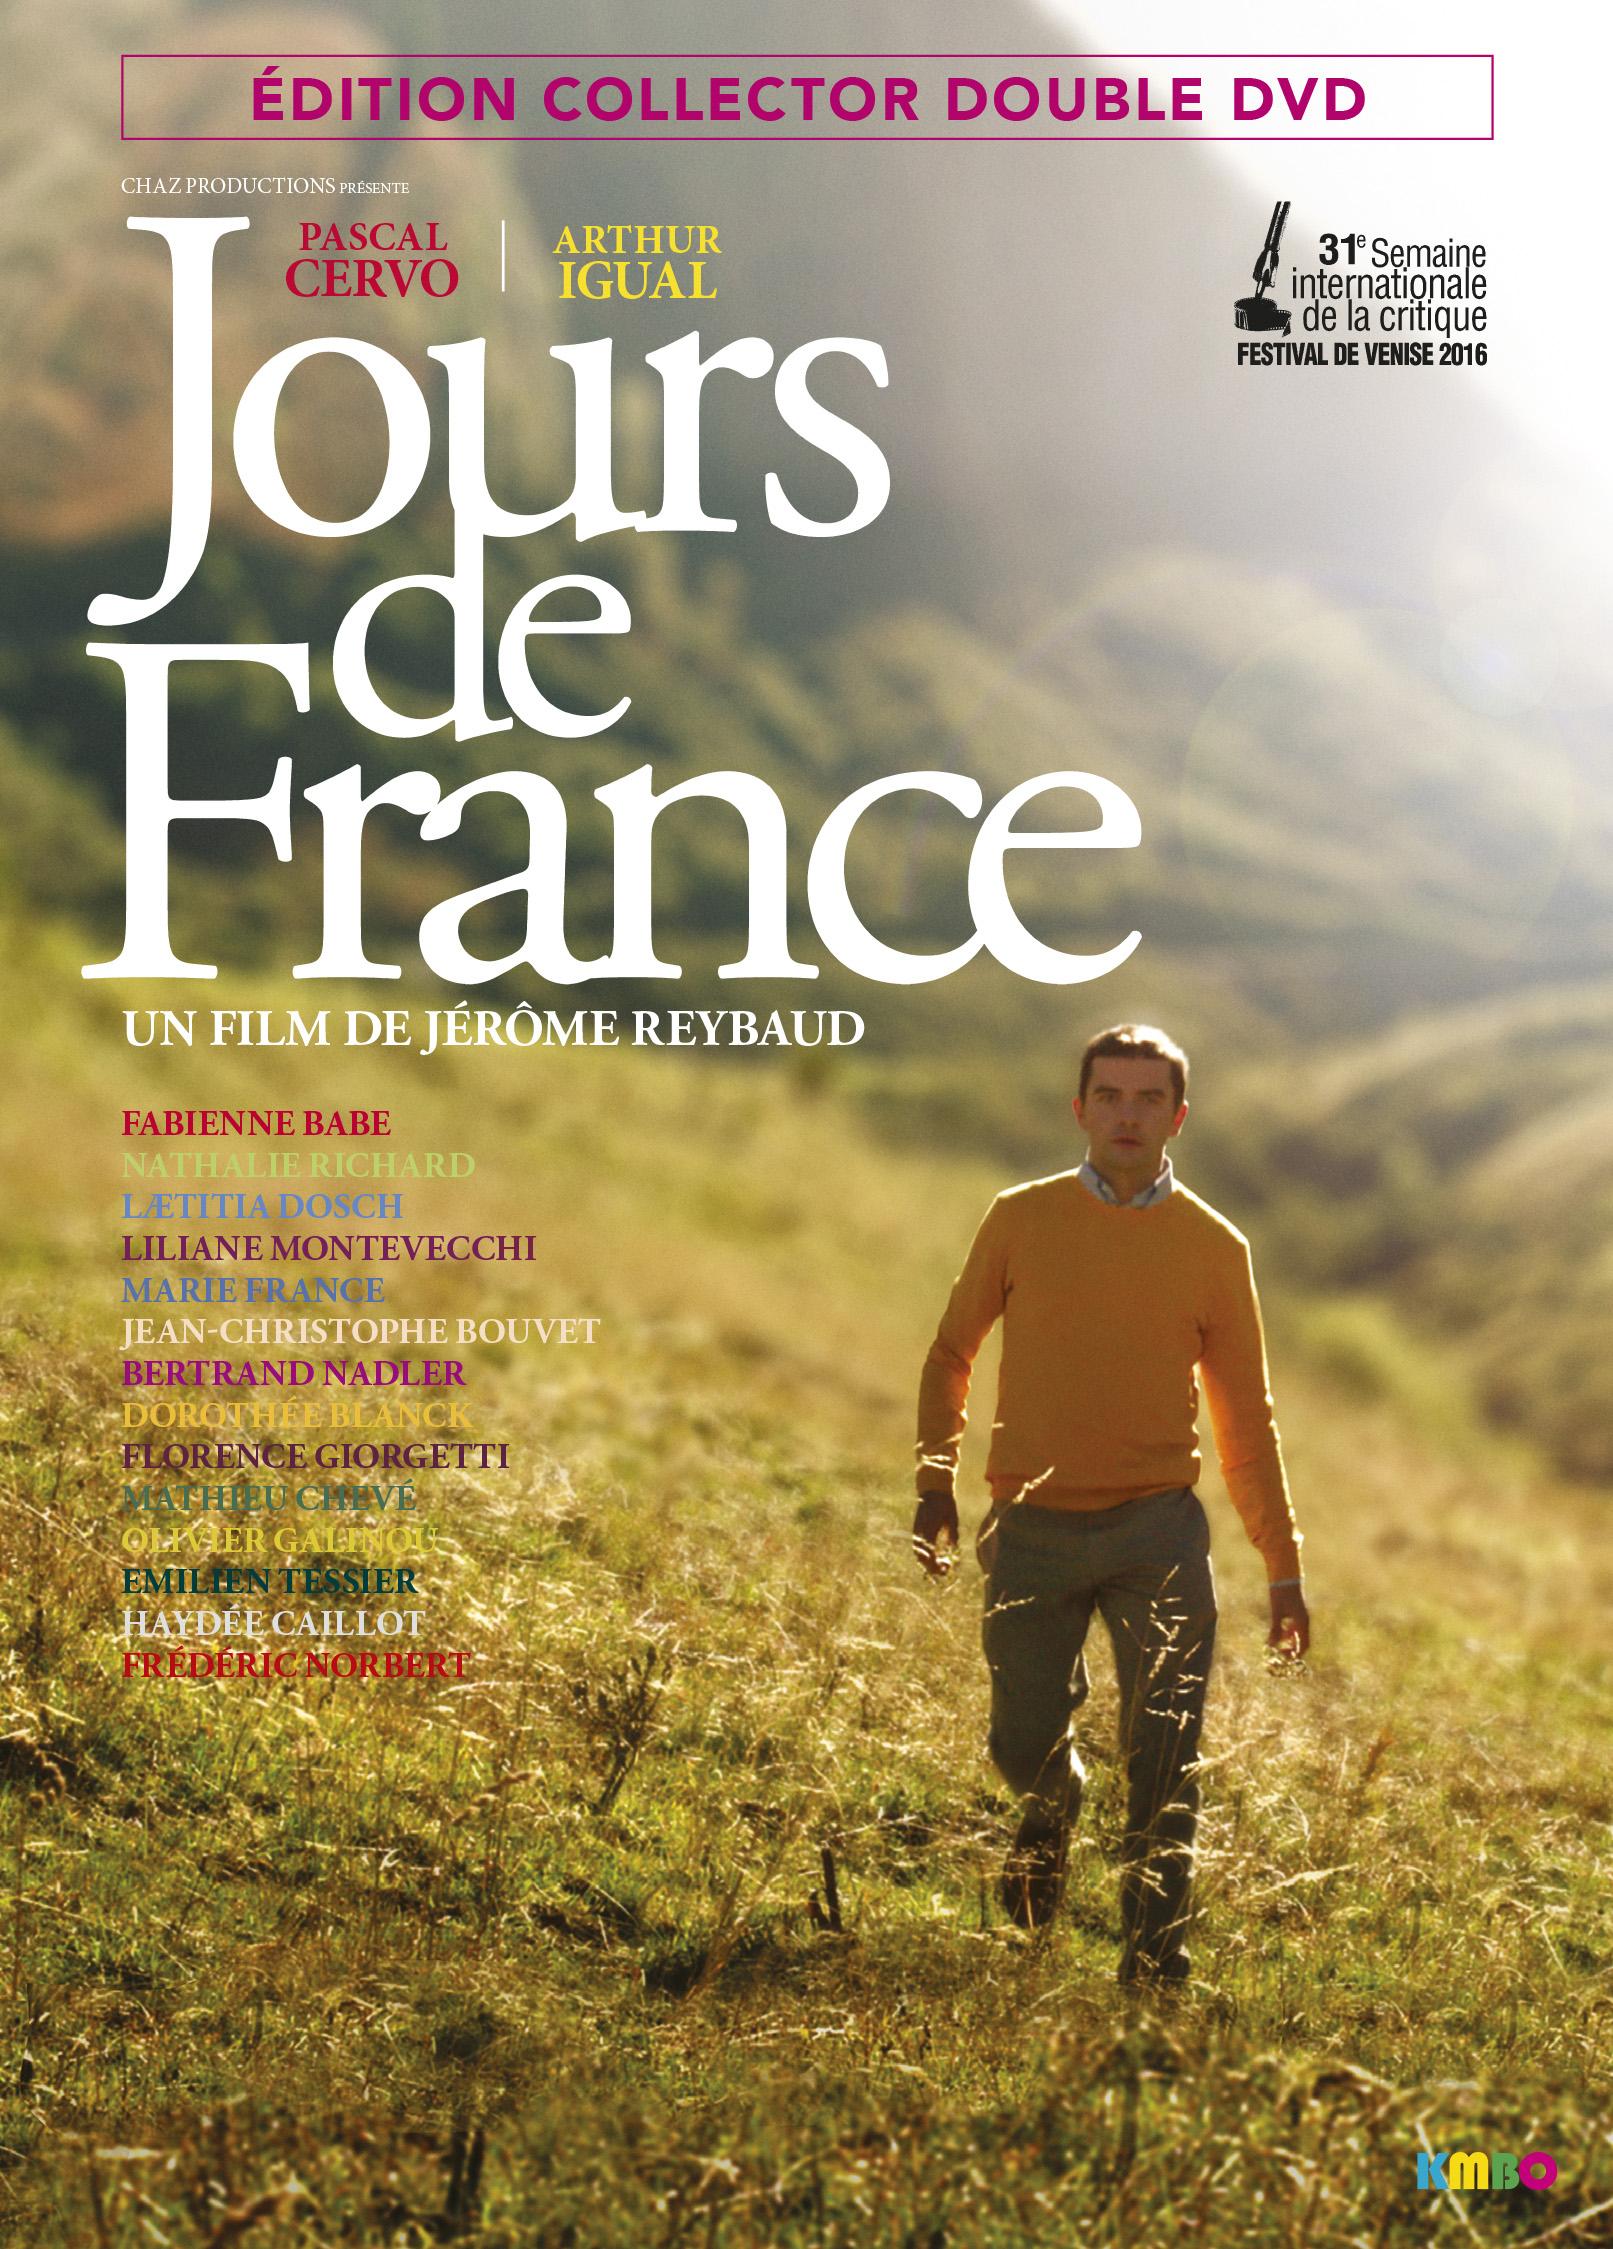 JOUR DE FRANCE [Edition Collector Double DVD]